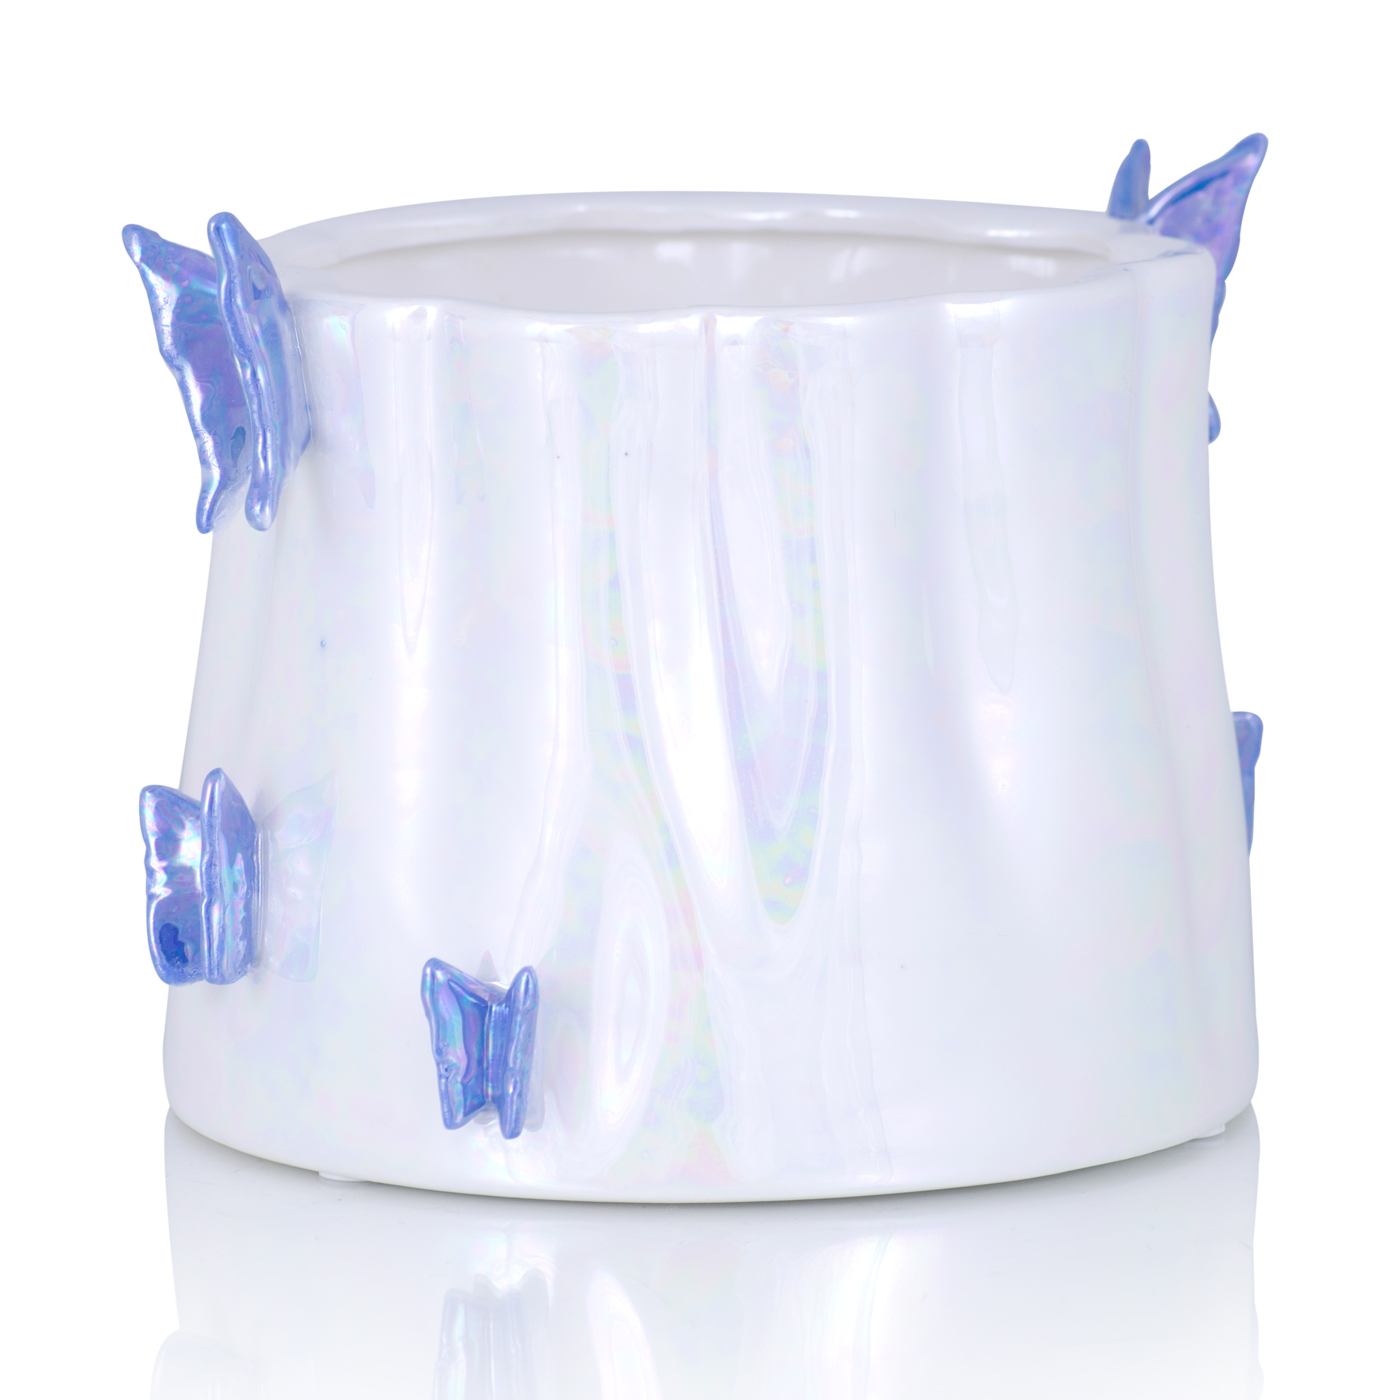 {} Home Philosophy Ваза Avery Цвет: Перламутровый-Синий (16х17х20 см) home philosophy ваза mariana цвет молочный набор